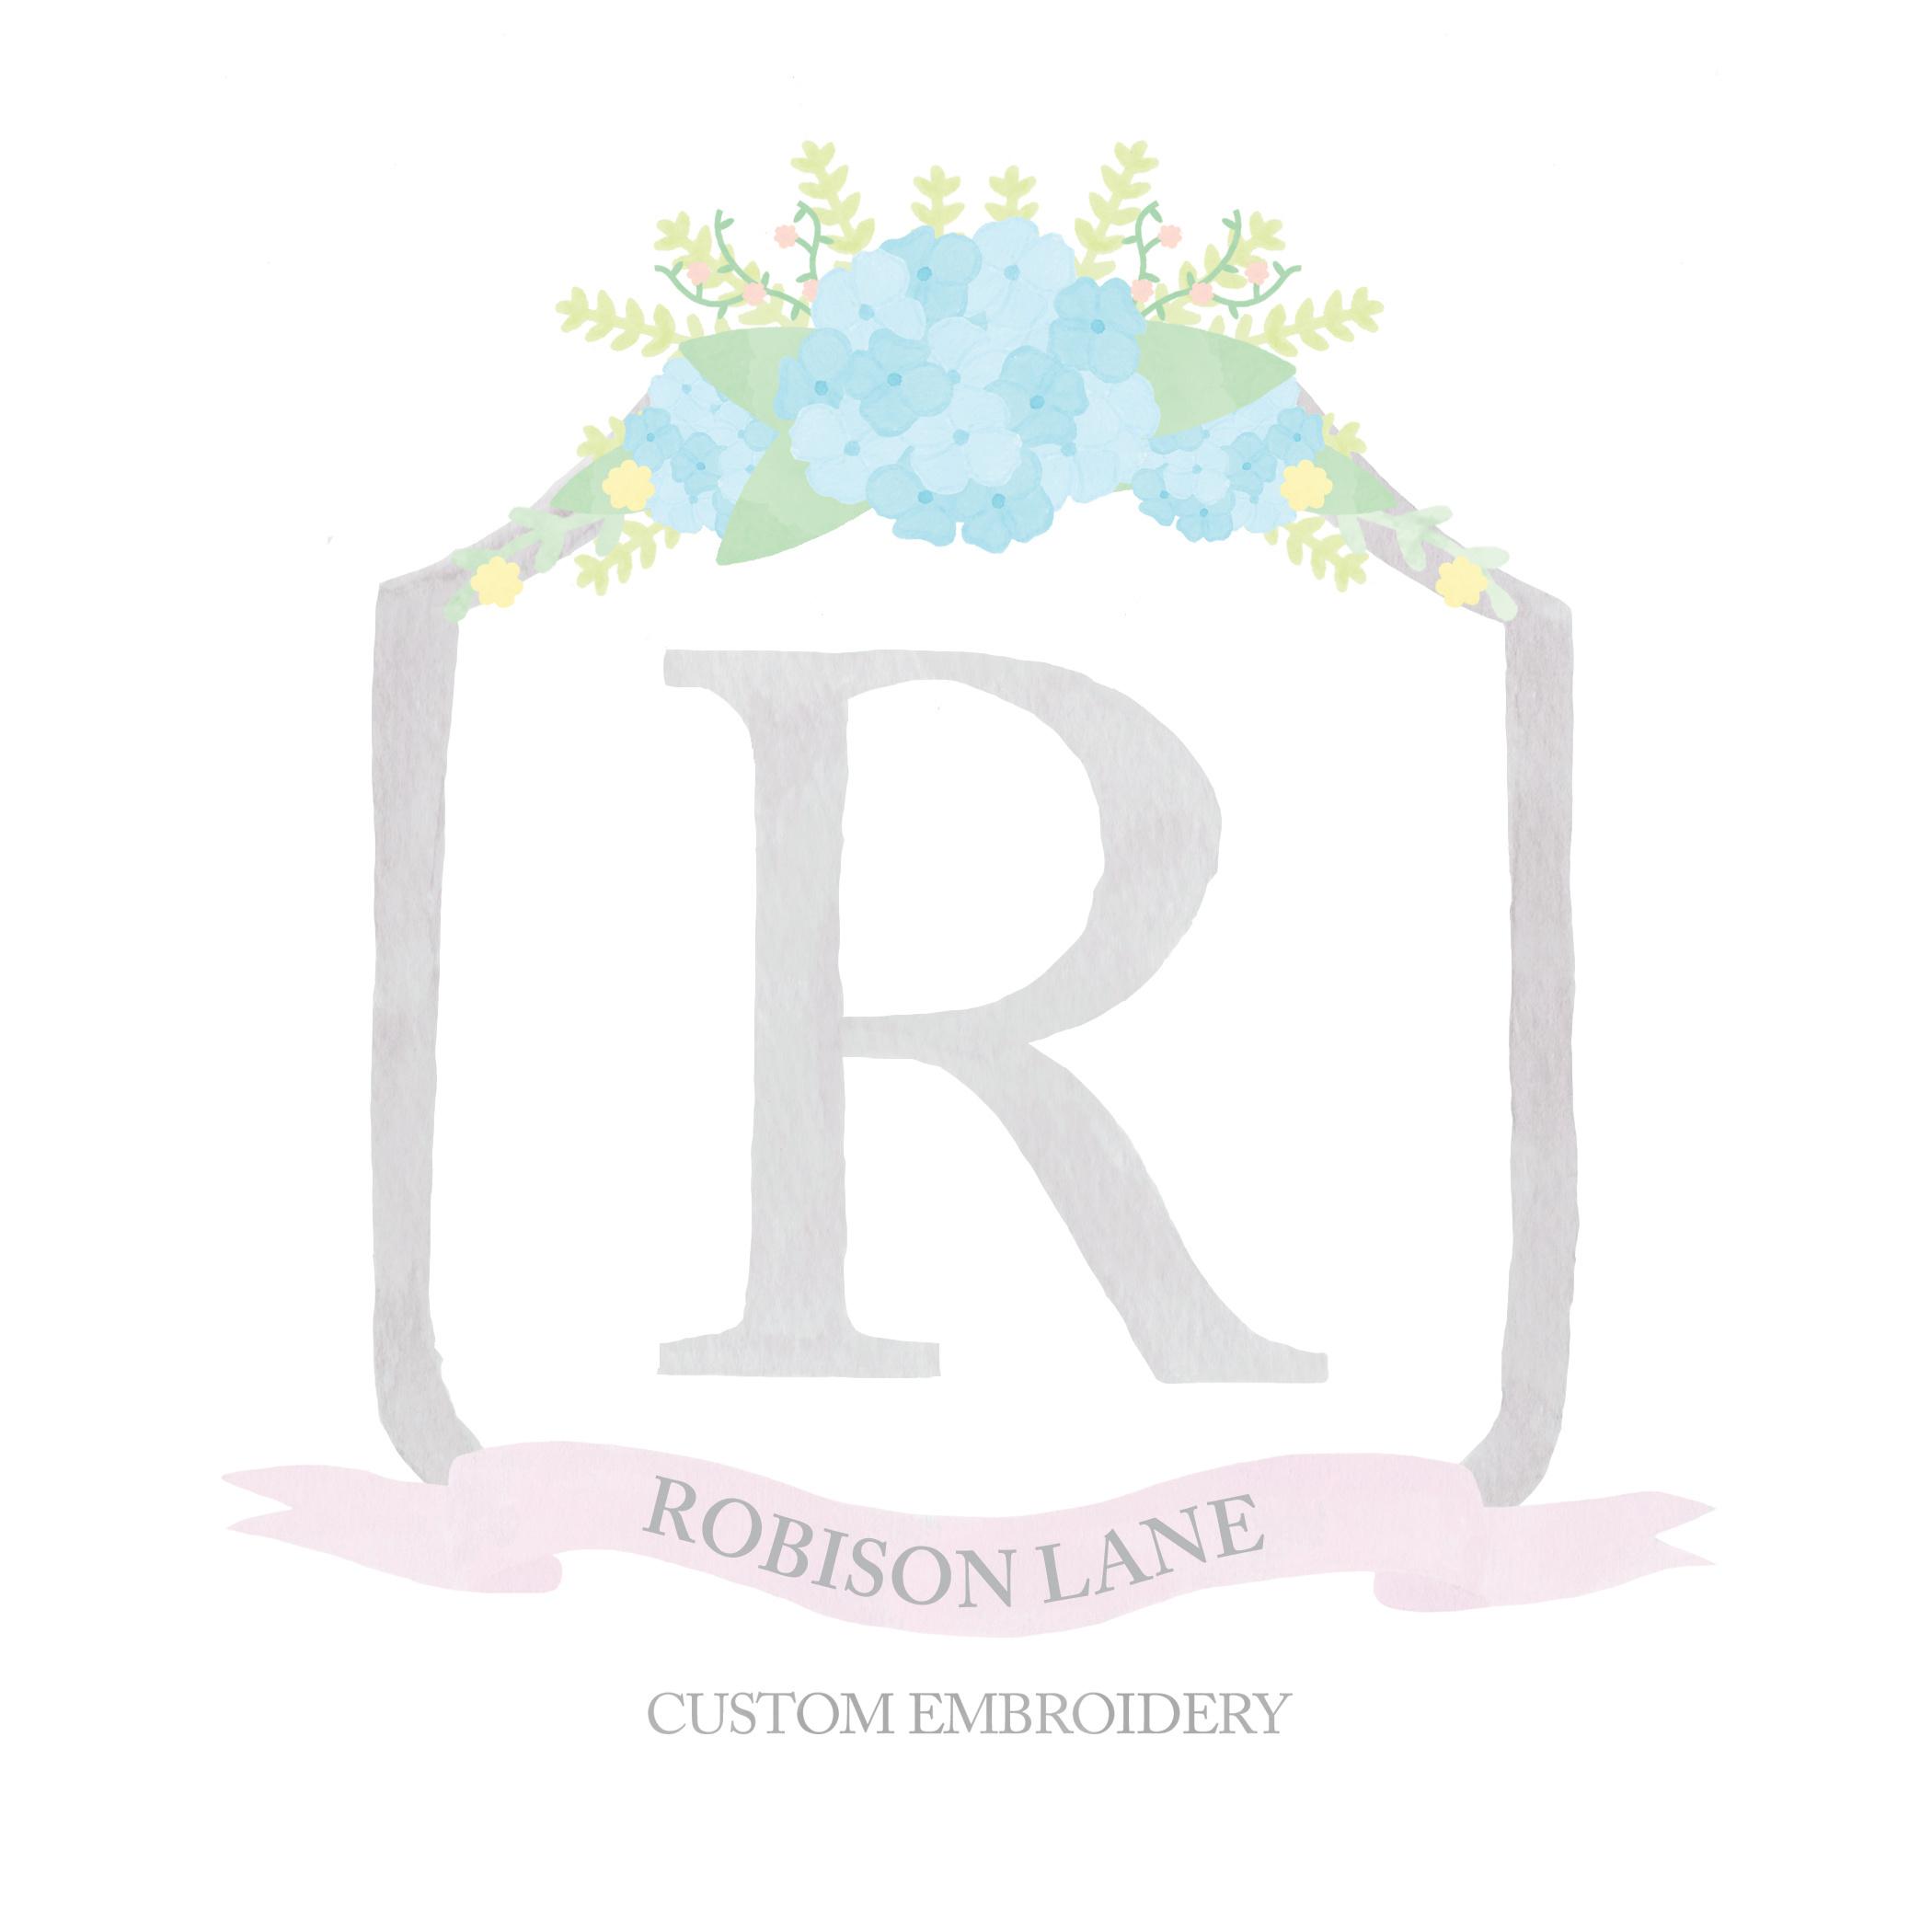 Robinson Lane